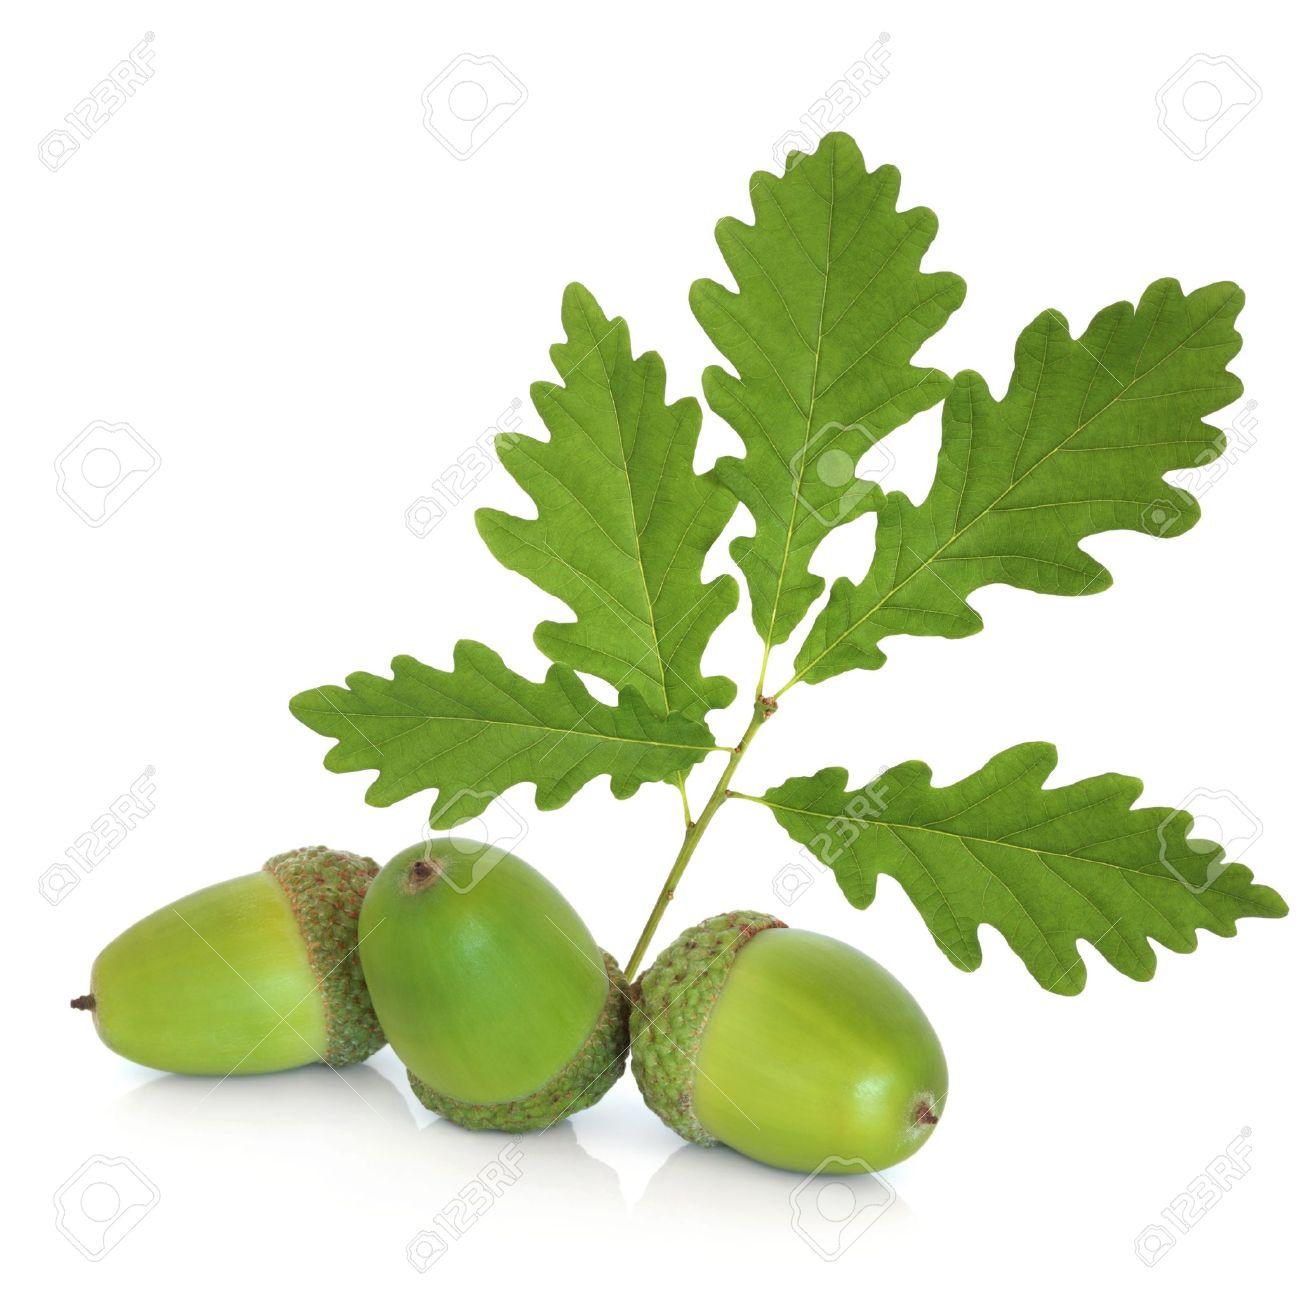 Acorn group with oak leaf, isolated over white background. Stock Photo - 7903187